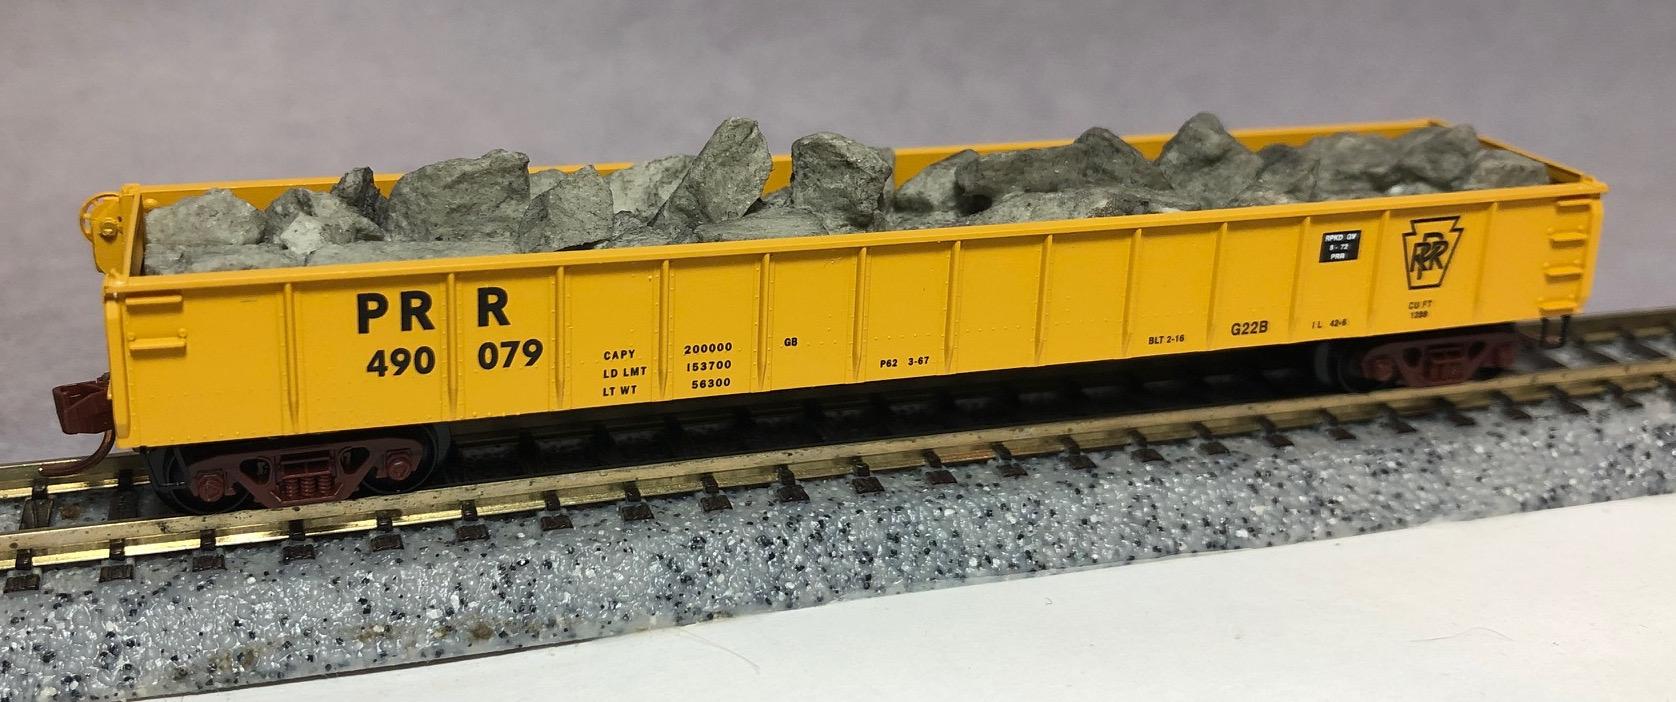 N Scale - Micro-Trains - NSC 01-19 - Gondola, 50 Foot, Steel - Pennsylvania - 490079